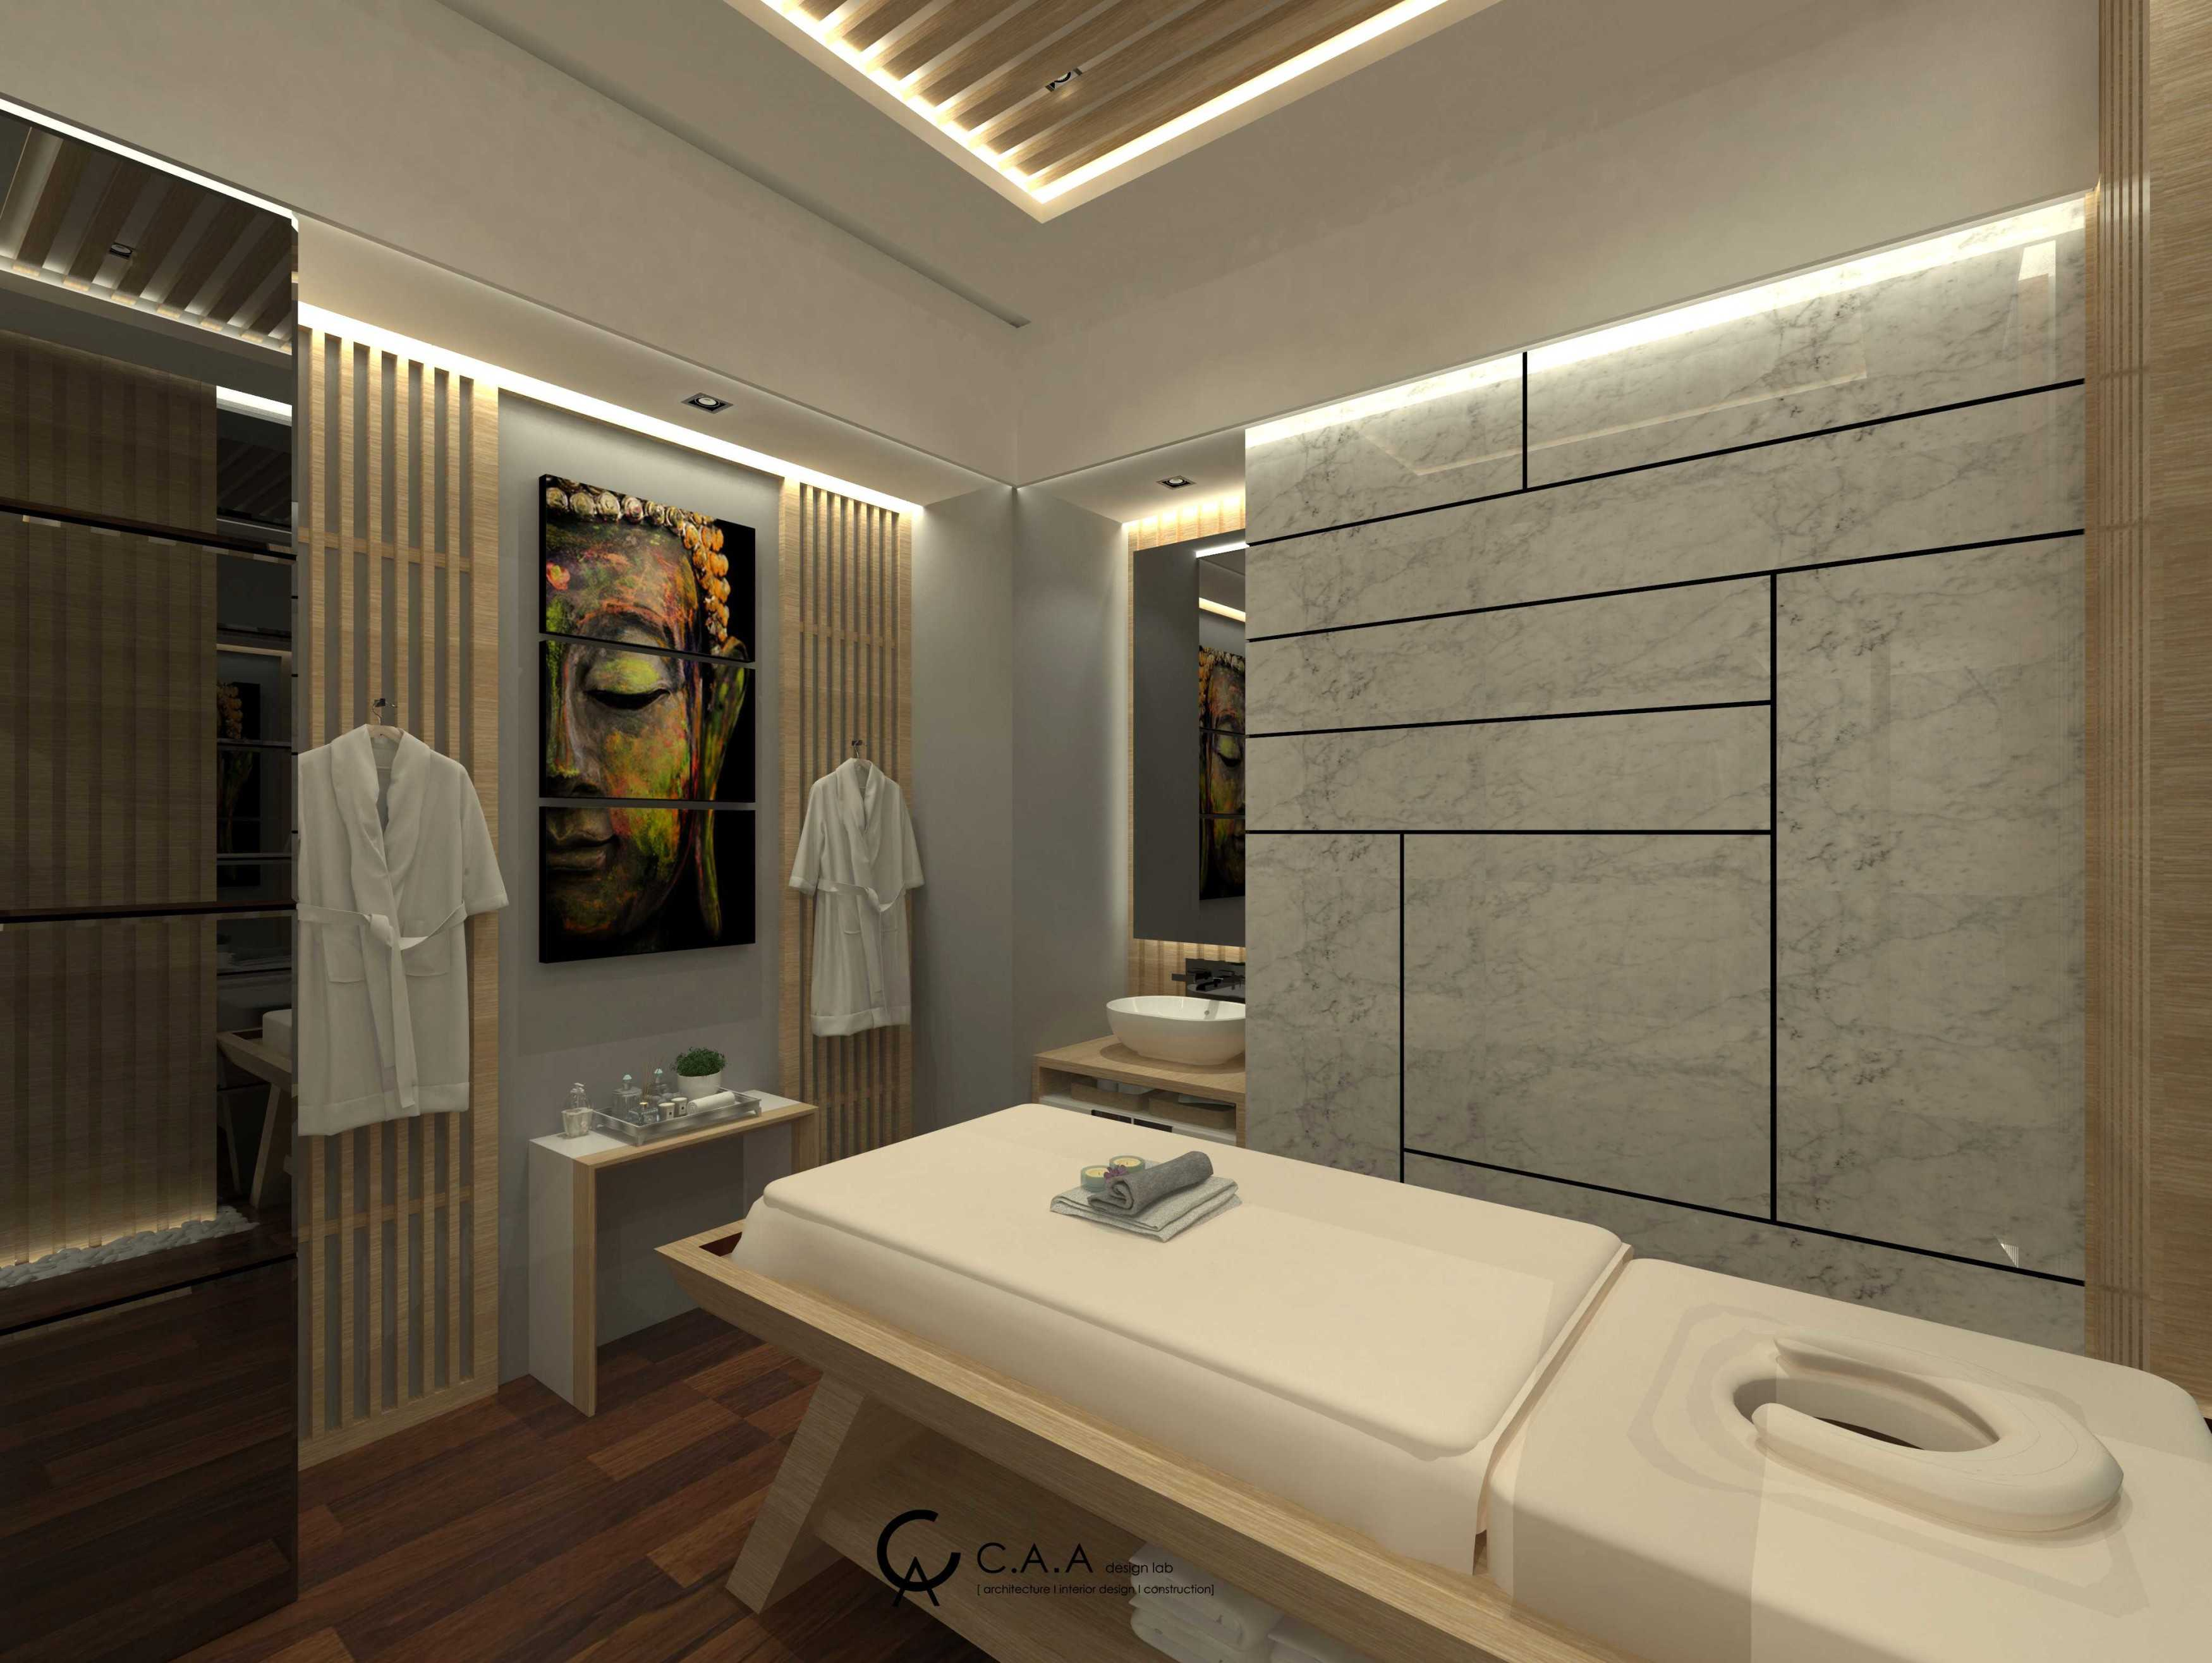 Ada Design Studio Four Point - Thamrin Jalan M.h. Thamrin Kav. 9 Jakarta Id-Jk, Gondangdia, Menteng, Kota Jakarta Pusat, Daerah Khusus Ibukota Jakarta 10350, Indonesia Jalan M.h. Thamrin Kav. 9 Jakarta Id-Jk, Gondangdia, Menteng, Kota Jakarta Pusat, Daerah Khusus Ibukota Jakarta 10350, Indonesia Ada-Design-Lab-Four-Point-Thamrin   67488